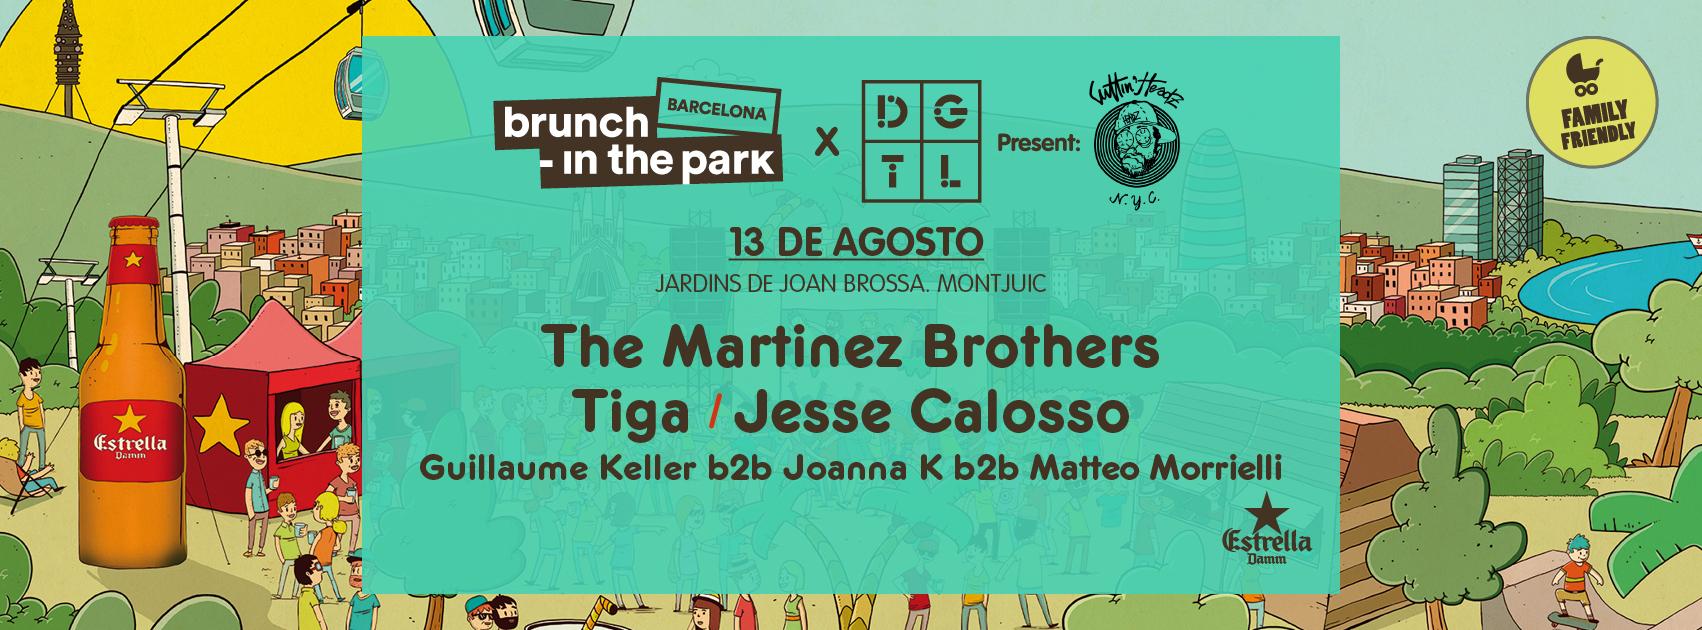 DGTL Barcelona and Brunch-In the Park